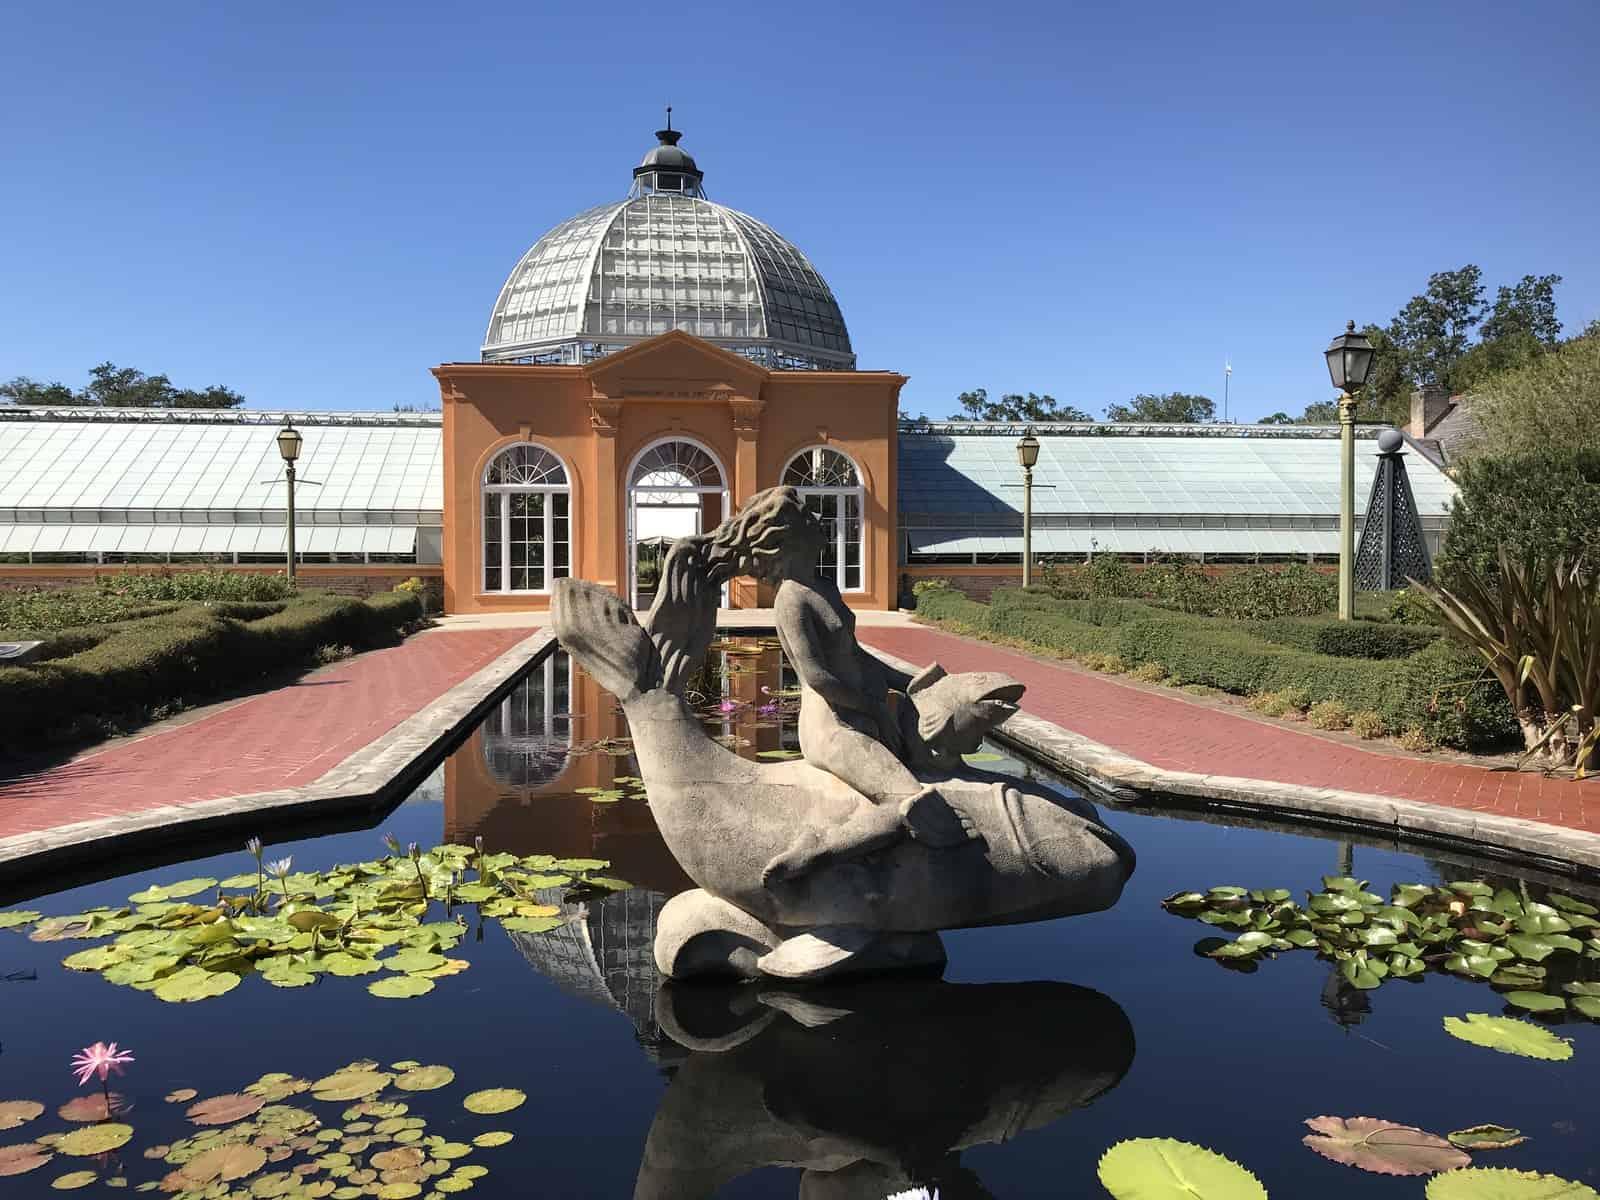 New Orleans Botanical Garden - AAS Winner Display Garden